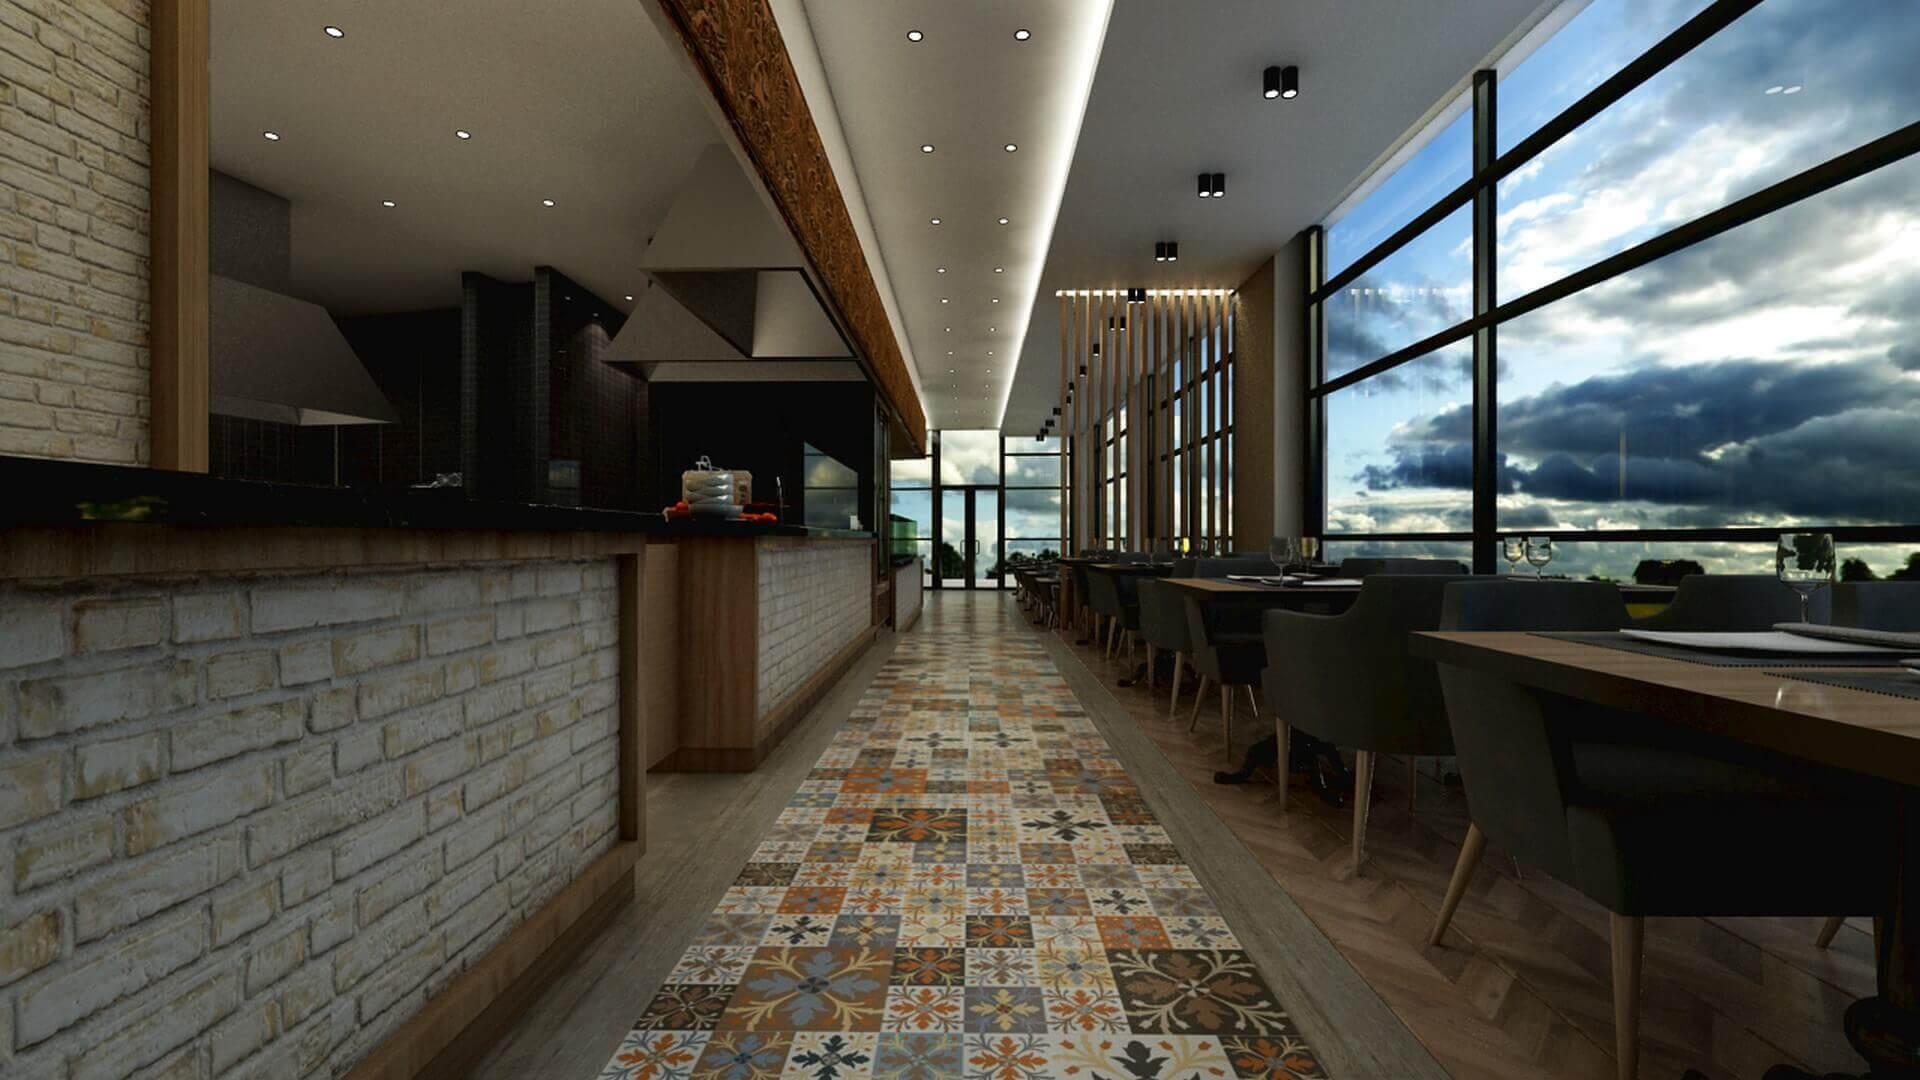 restorant iç mimar 2070 Otonomi Restoran Restoranlar